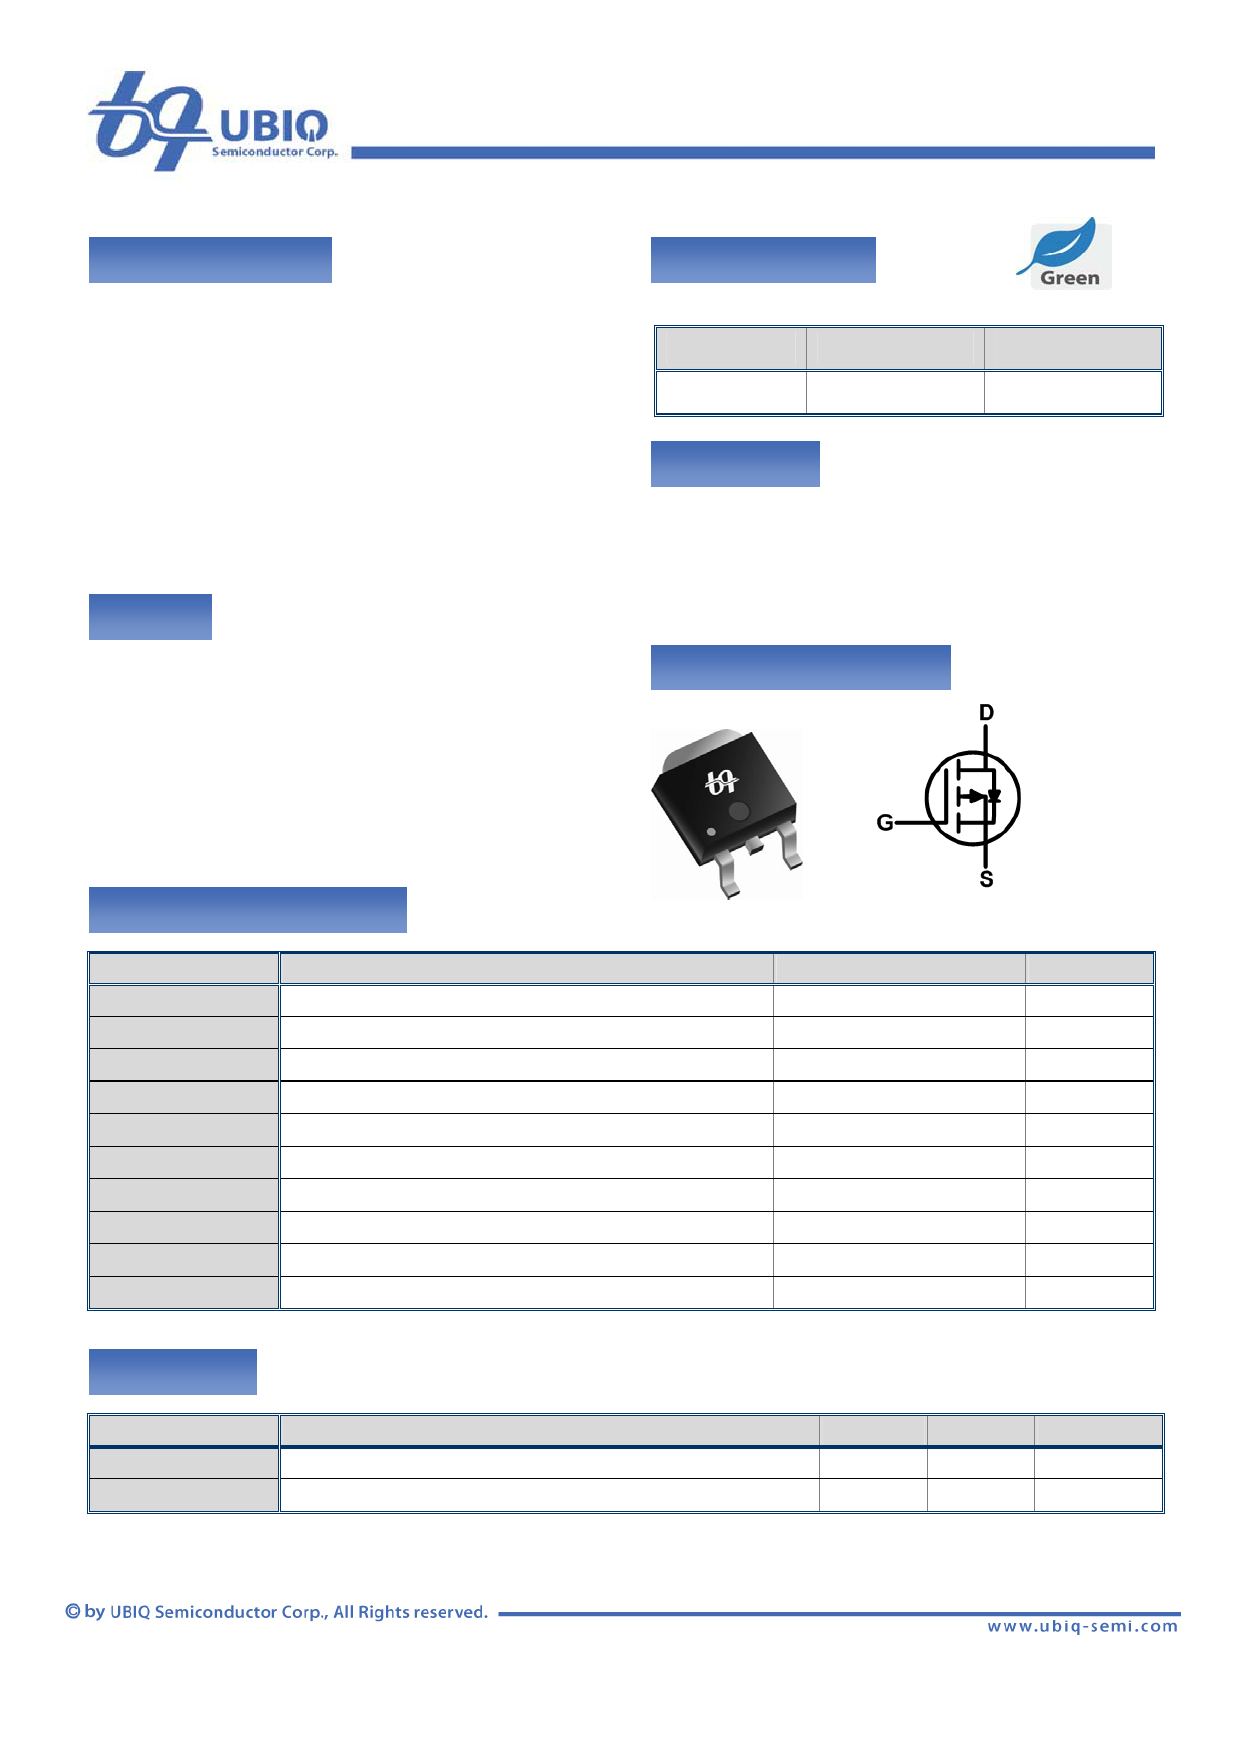 QM4013D 데이터시트 및 QM4013D PDF